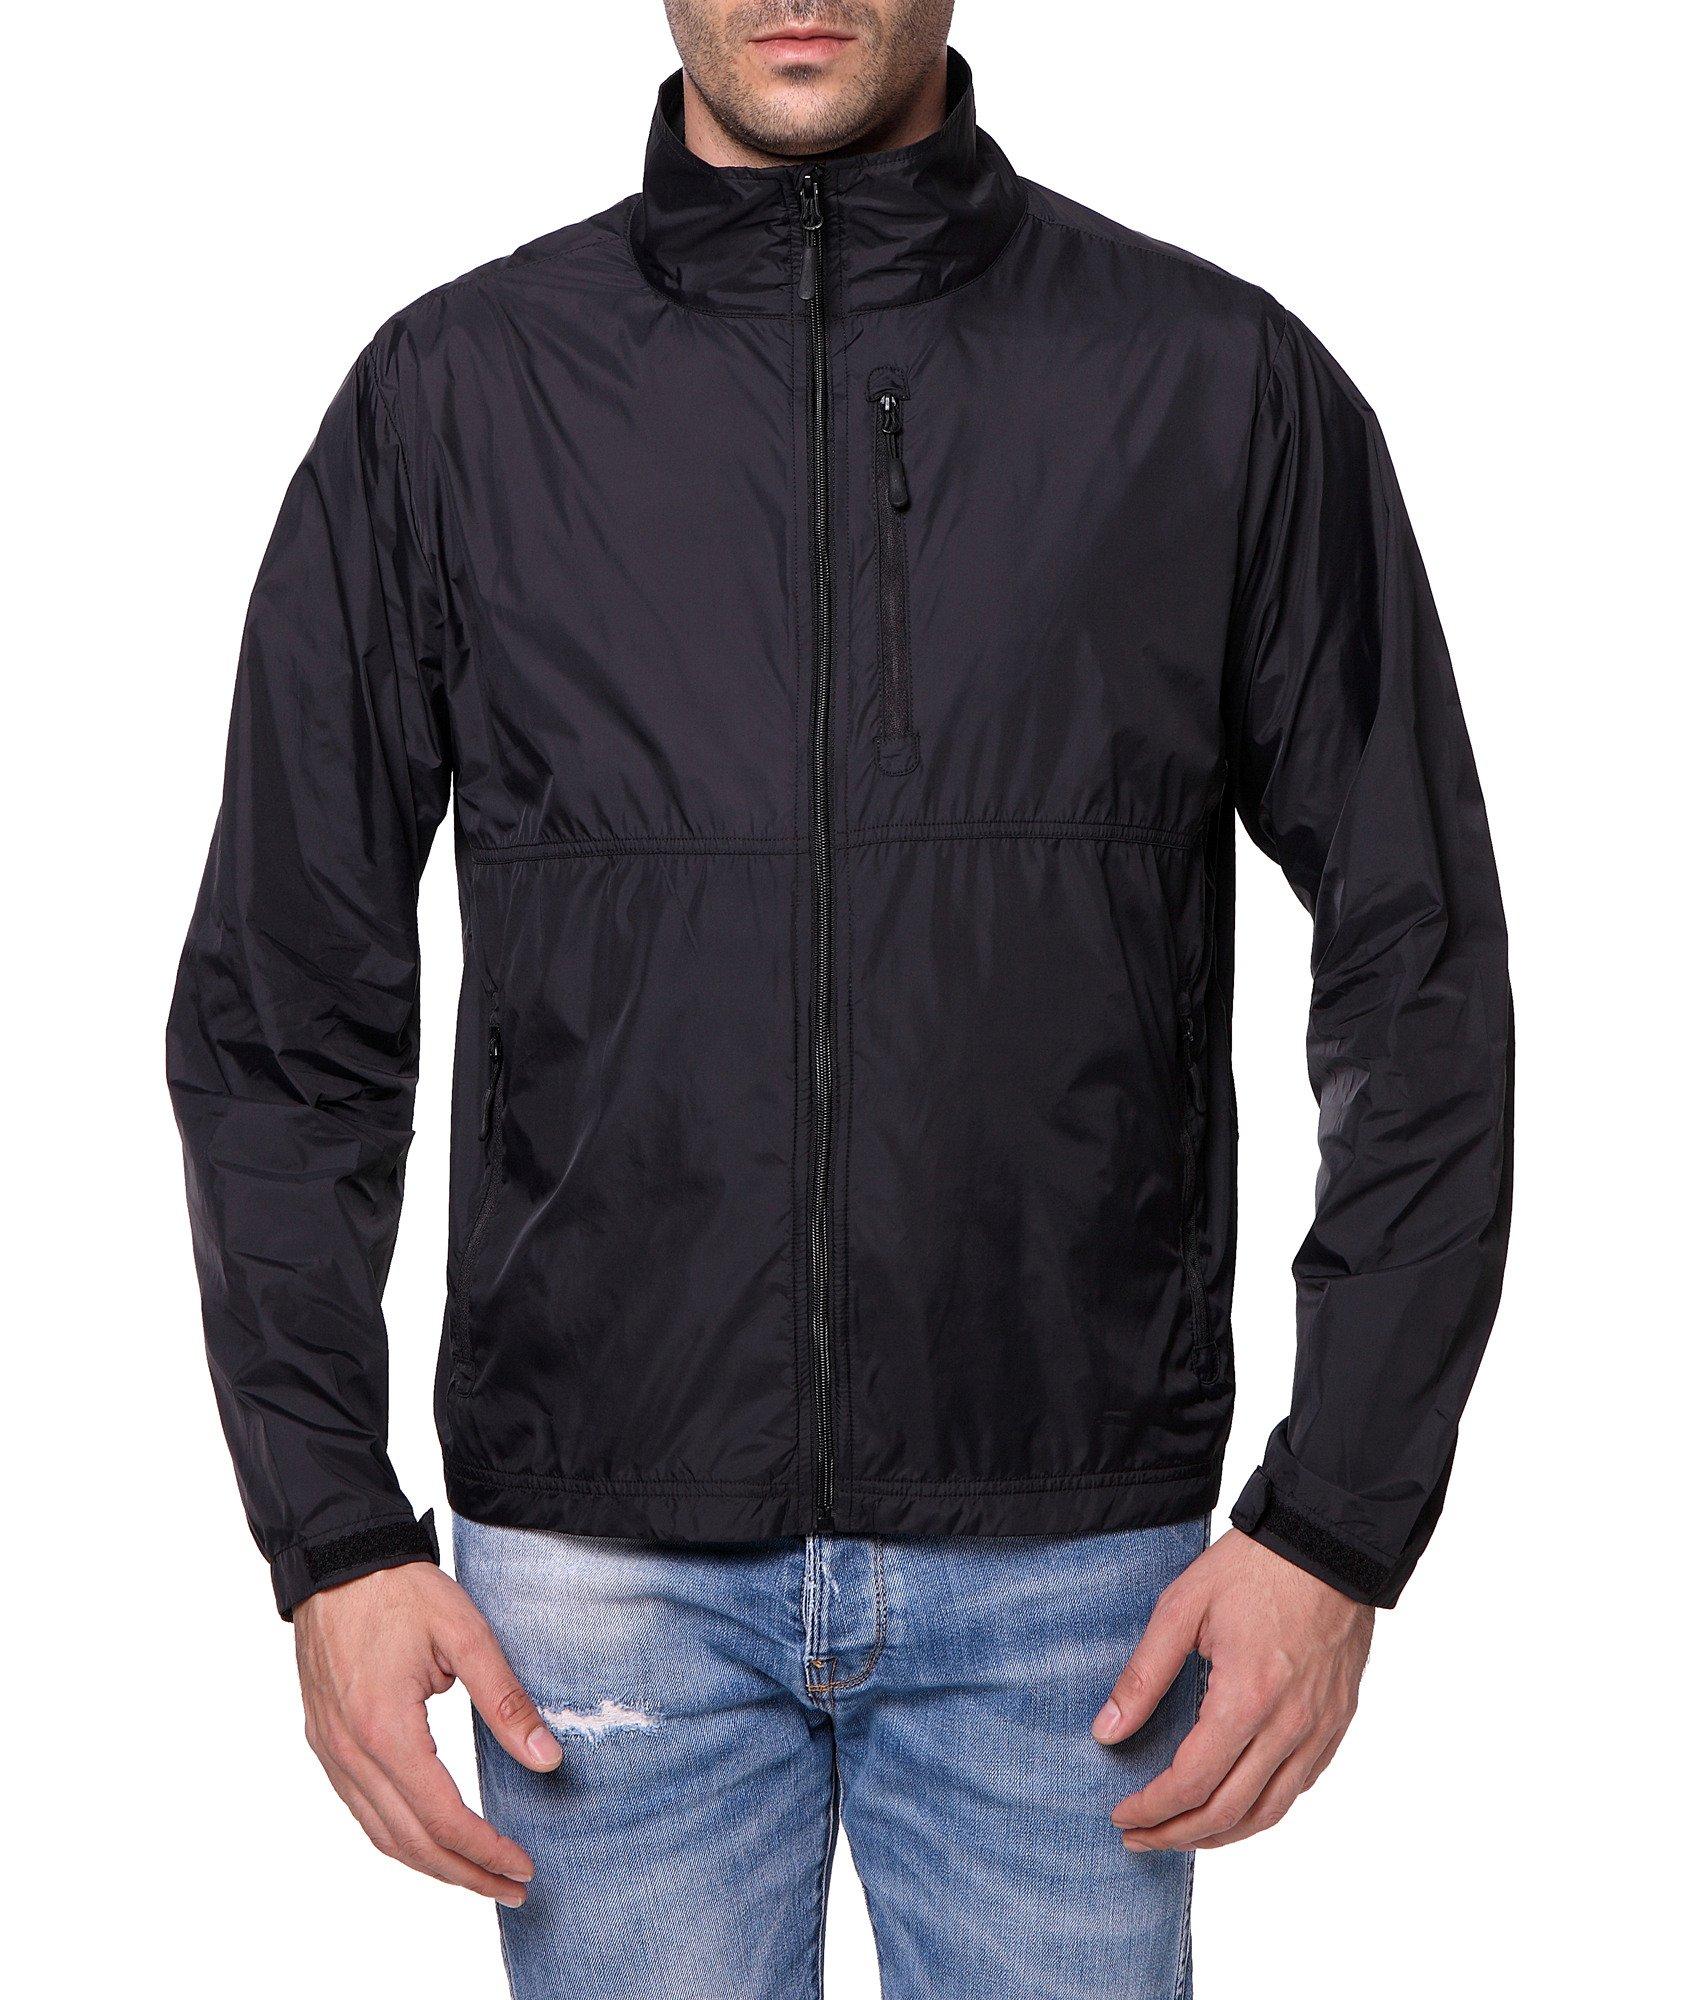 Trailside Supply Co. Men's Standard Water-Resistant Nylon Windbreaker Front-Zip up Jacket, Jet Black, Large by Trailside Supply Co.